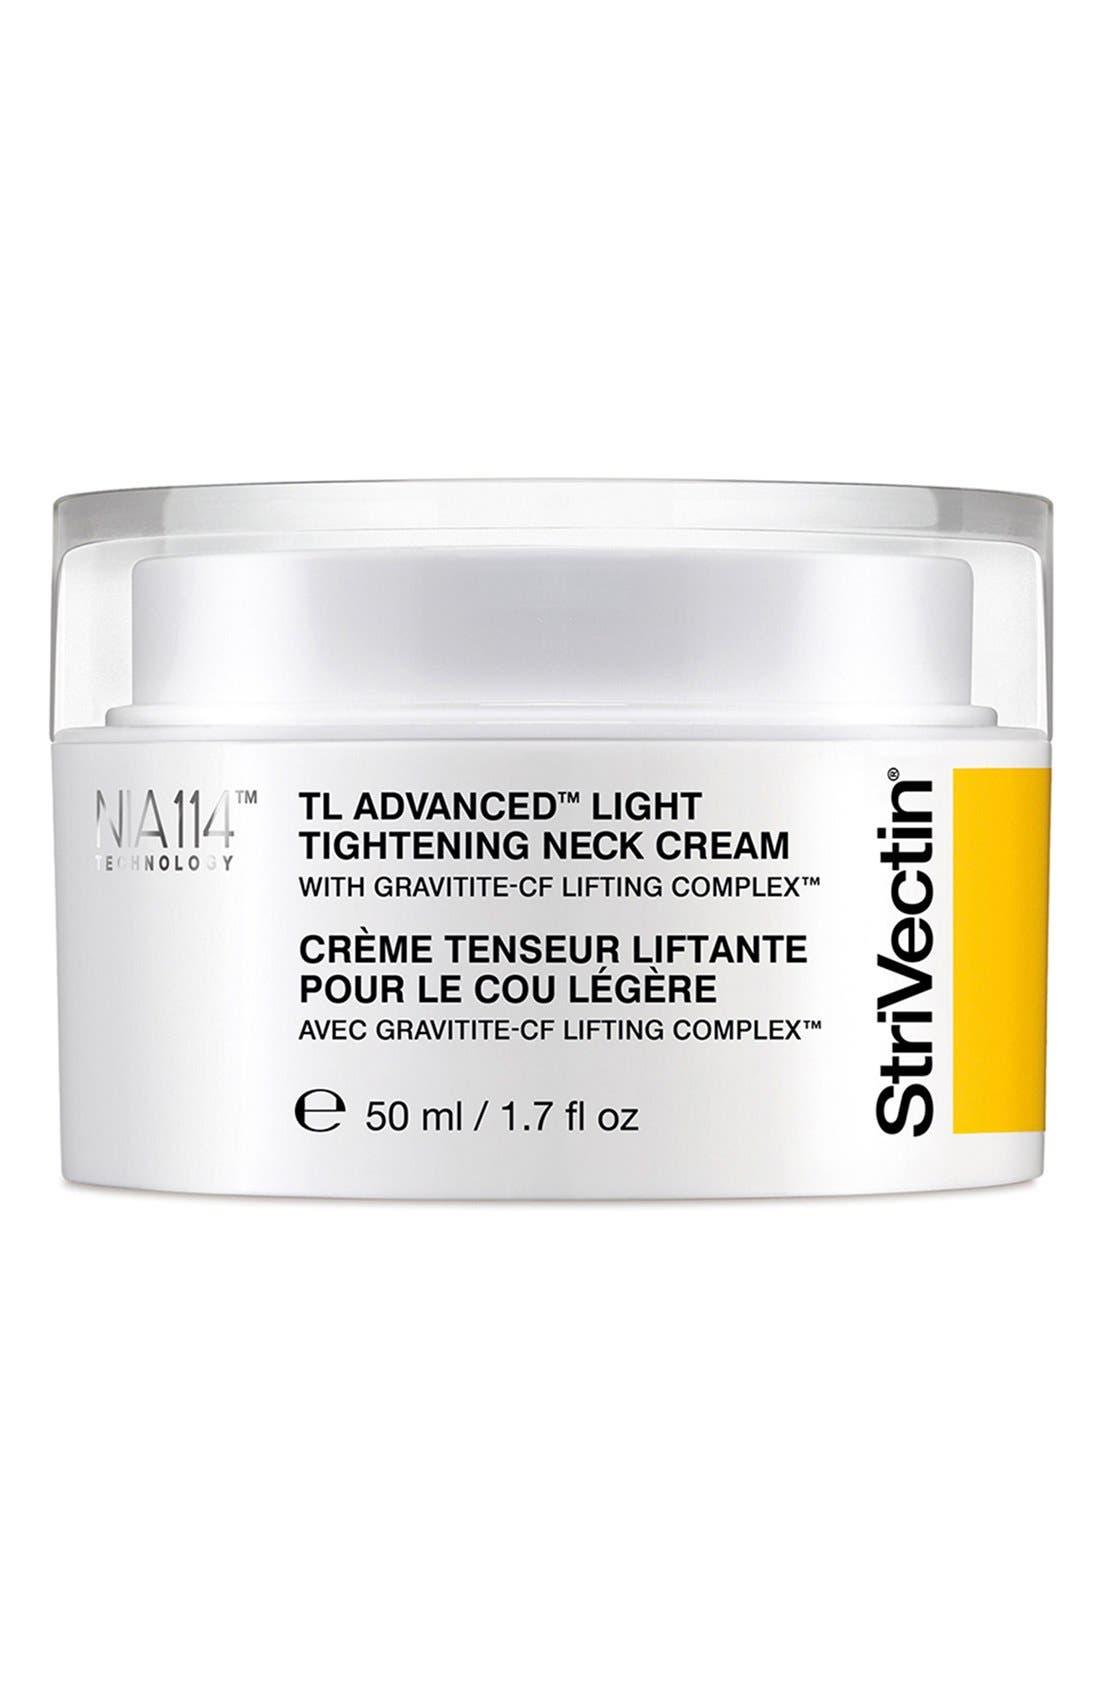 StriVectin-TL<sup>™</sup> Advanced Light Tightening Neck Cream,                             Main thumbnail 1, color,                             NO COLOR